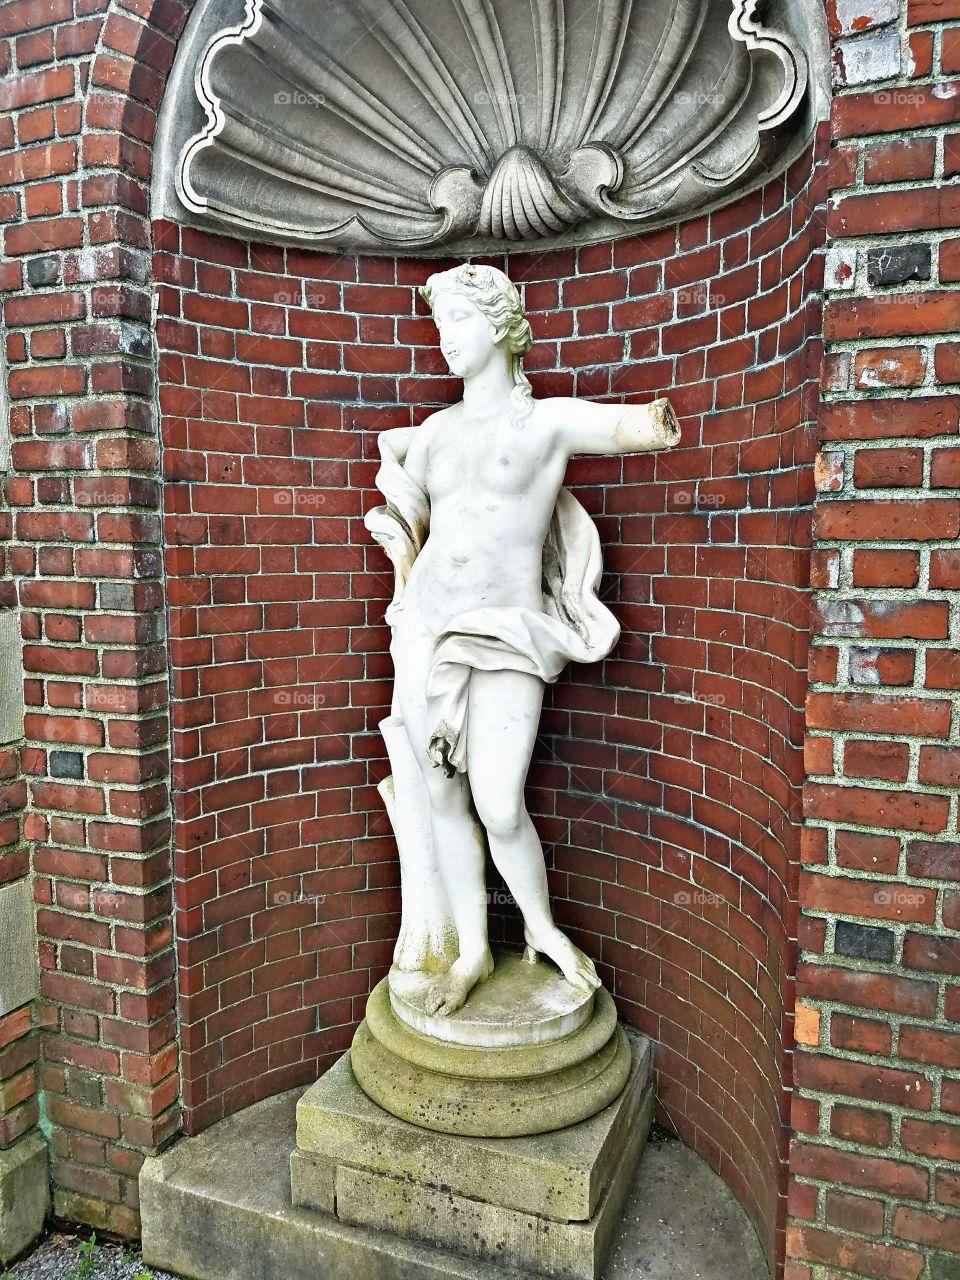 Statue, Sculpture, Architecture, Stone, Art